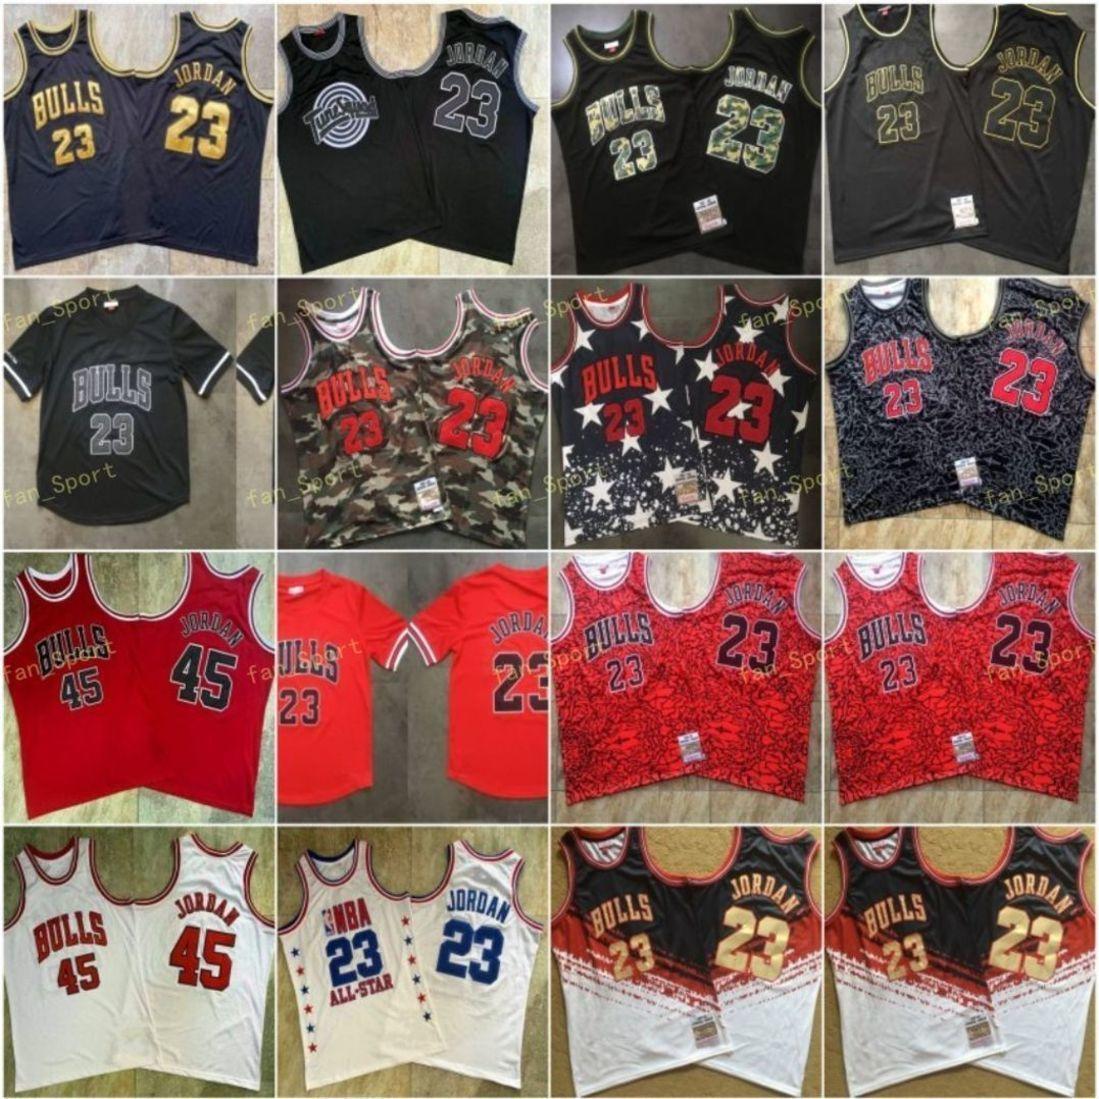 M N Vintage Micheal # 23 94-95 03 All Tune Squad Mesh Bordotery Logos Stitched Basketball Jerseys Negro Blanco Rojo